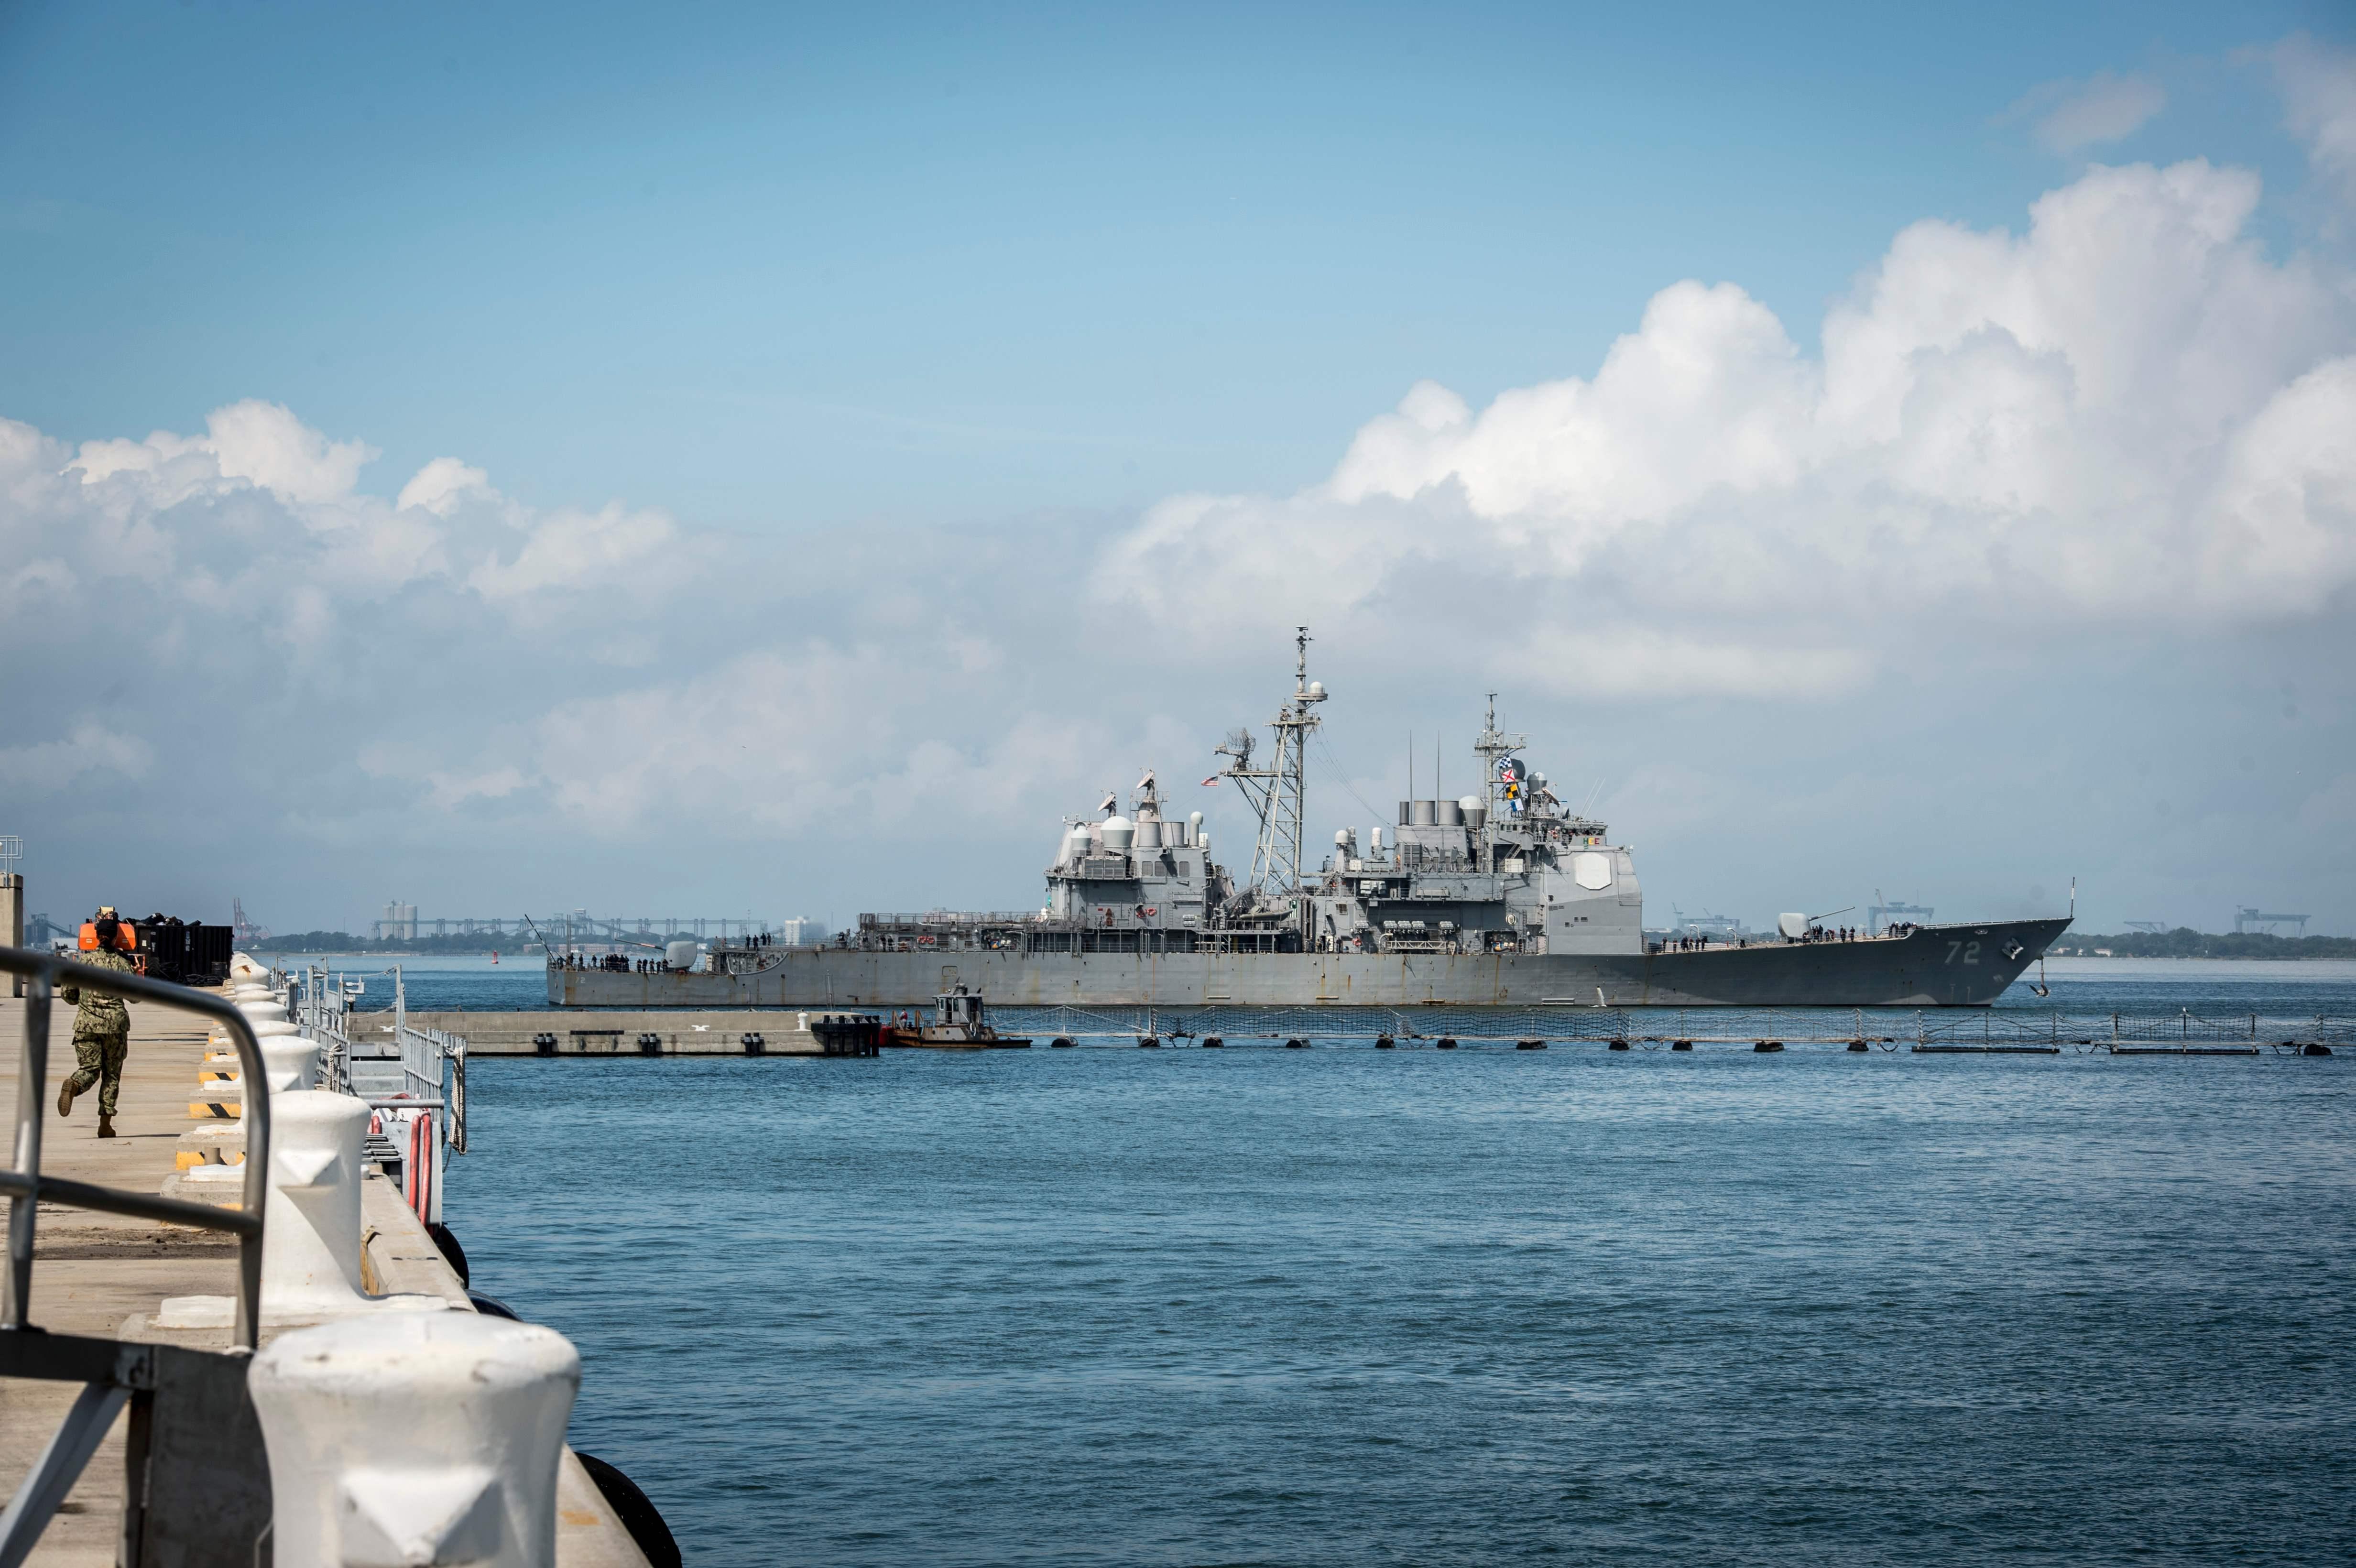 سفن امريكا تغادر خوفا من الاعصار